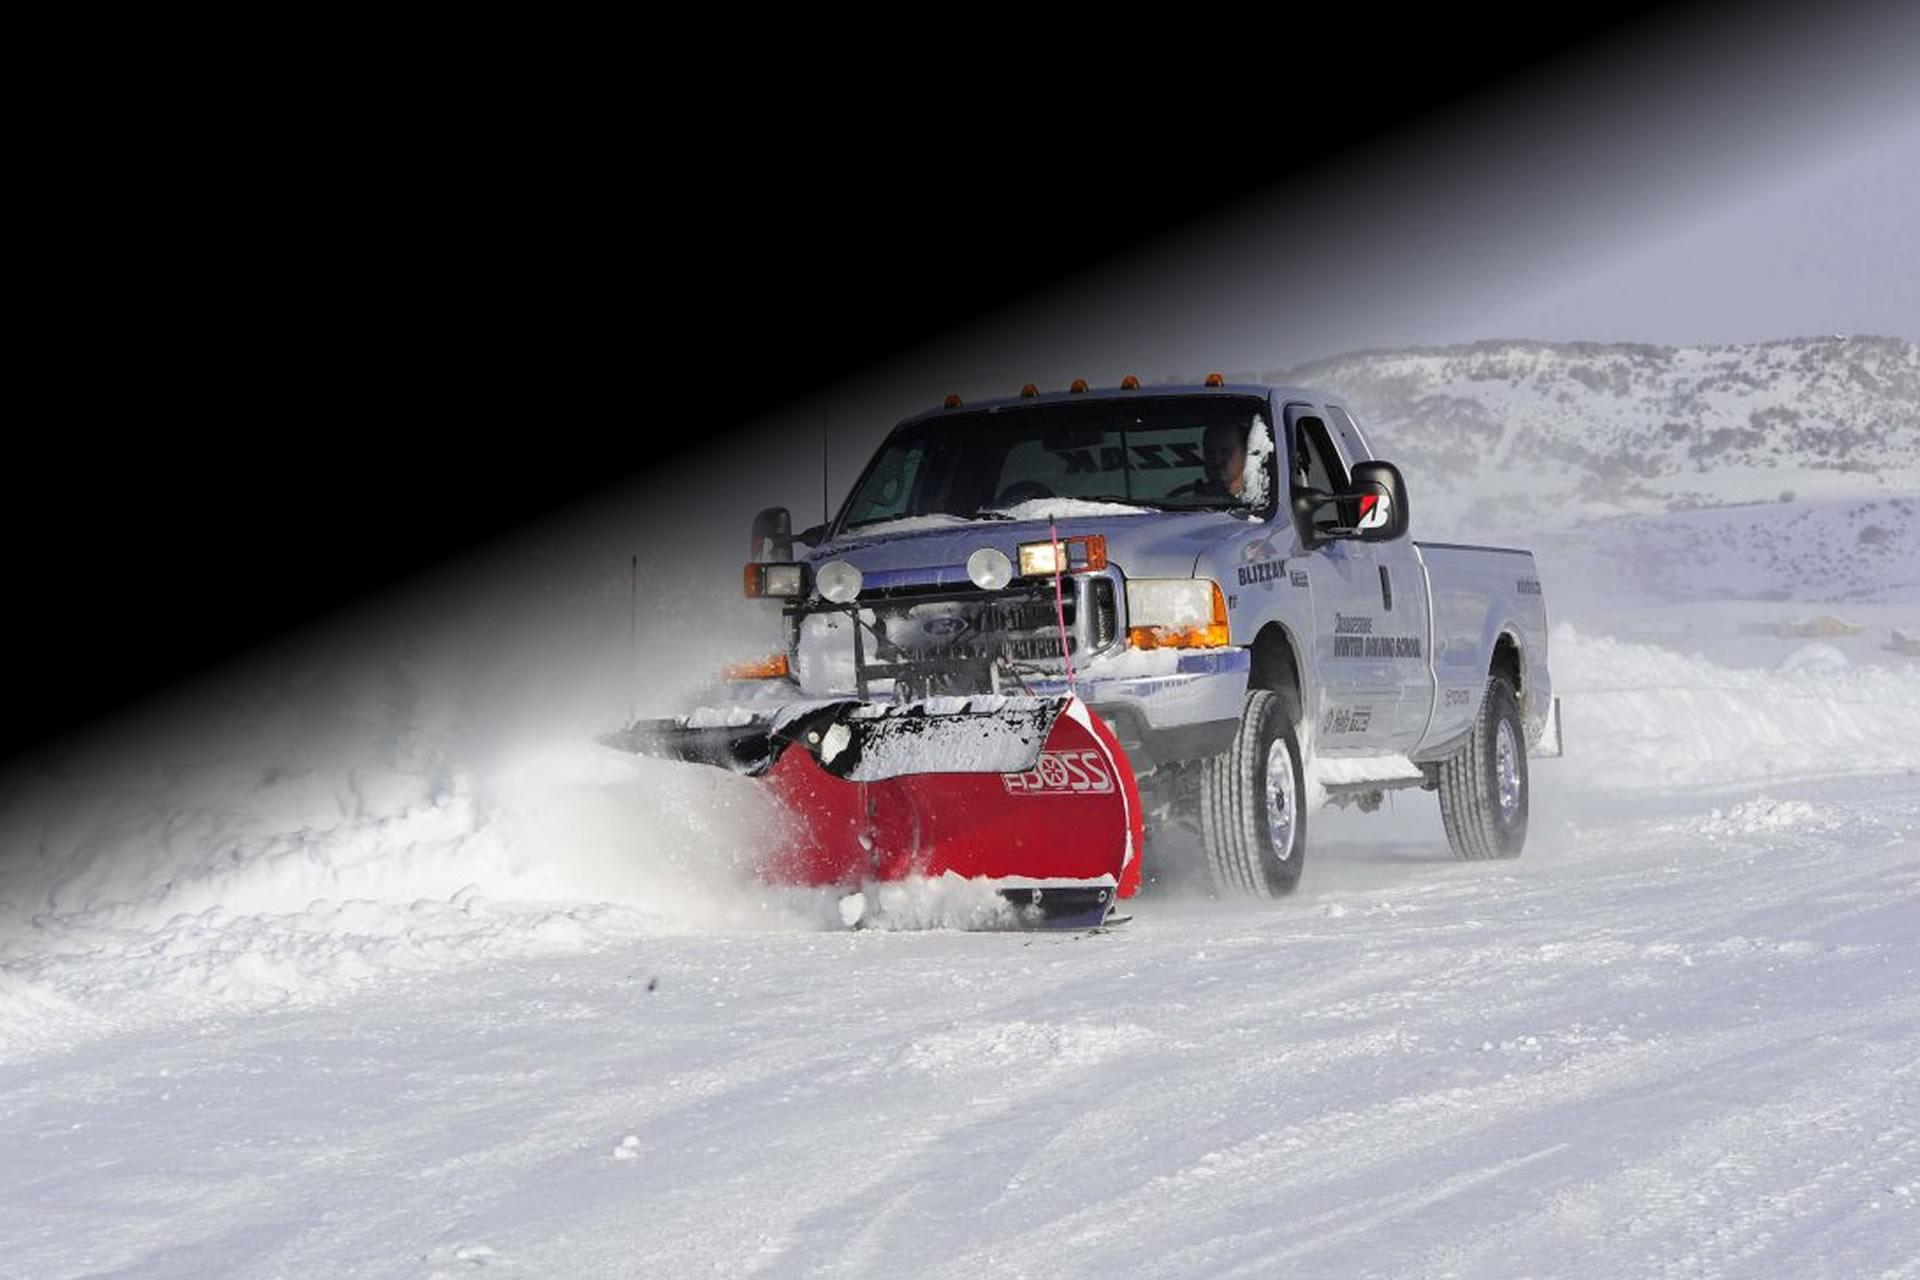 http://homesweethomelandscaping.com/sites/default/files/revslider/image/Slide03-Snow-Plowing_0.jpg